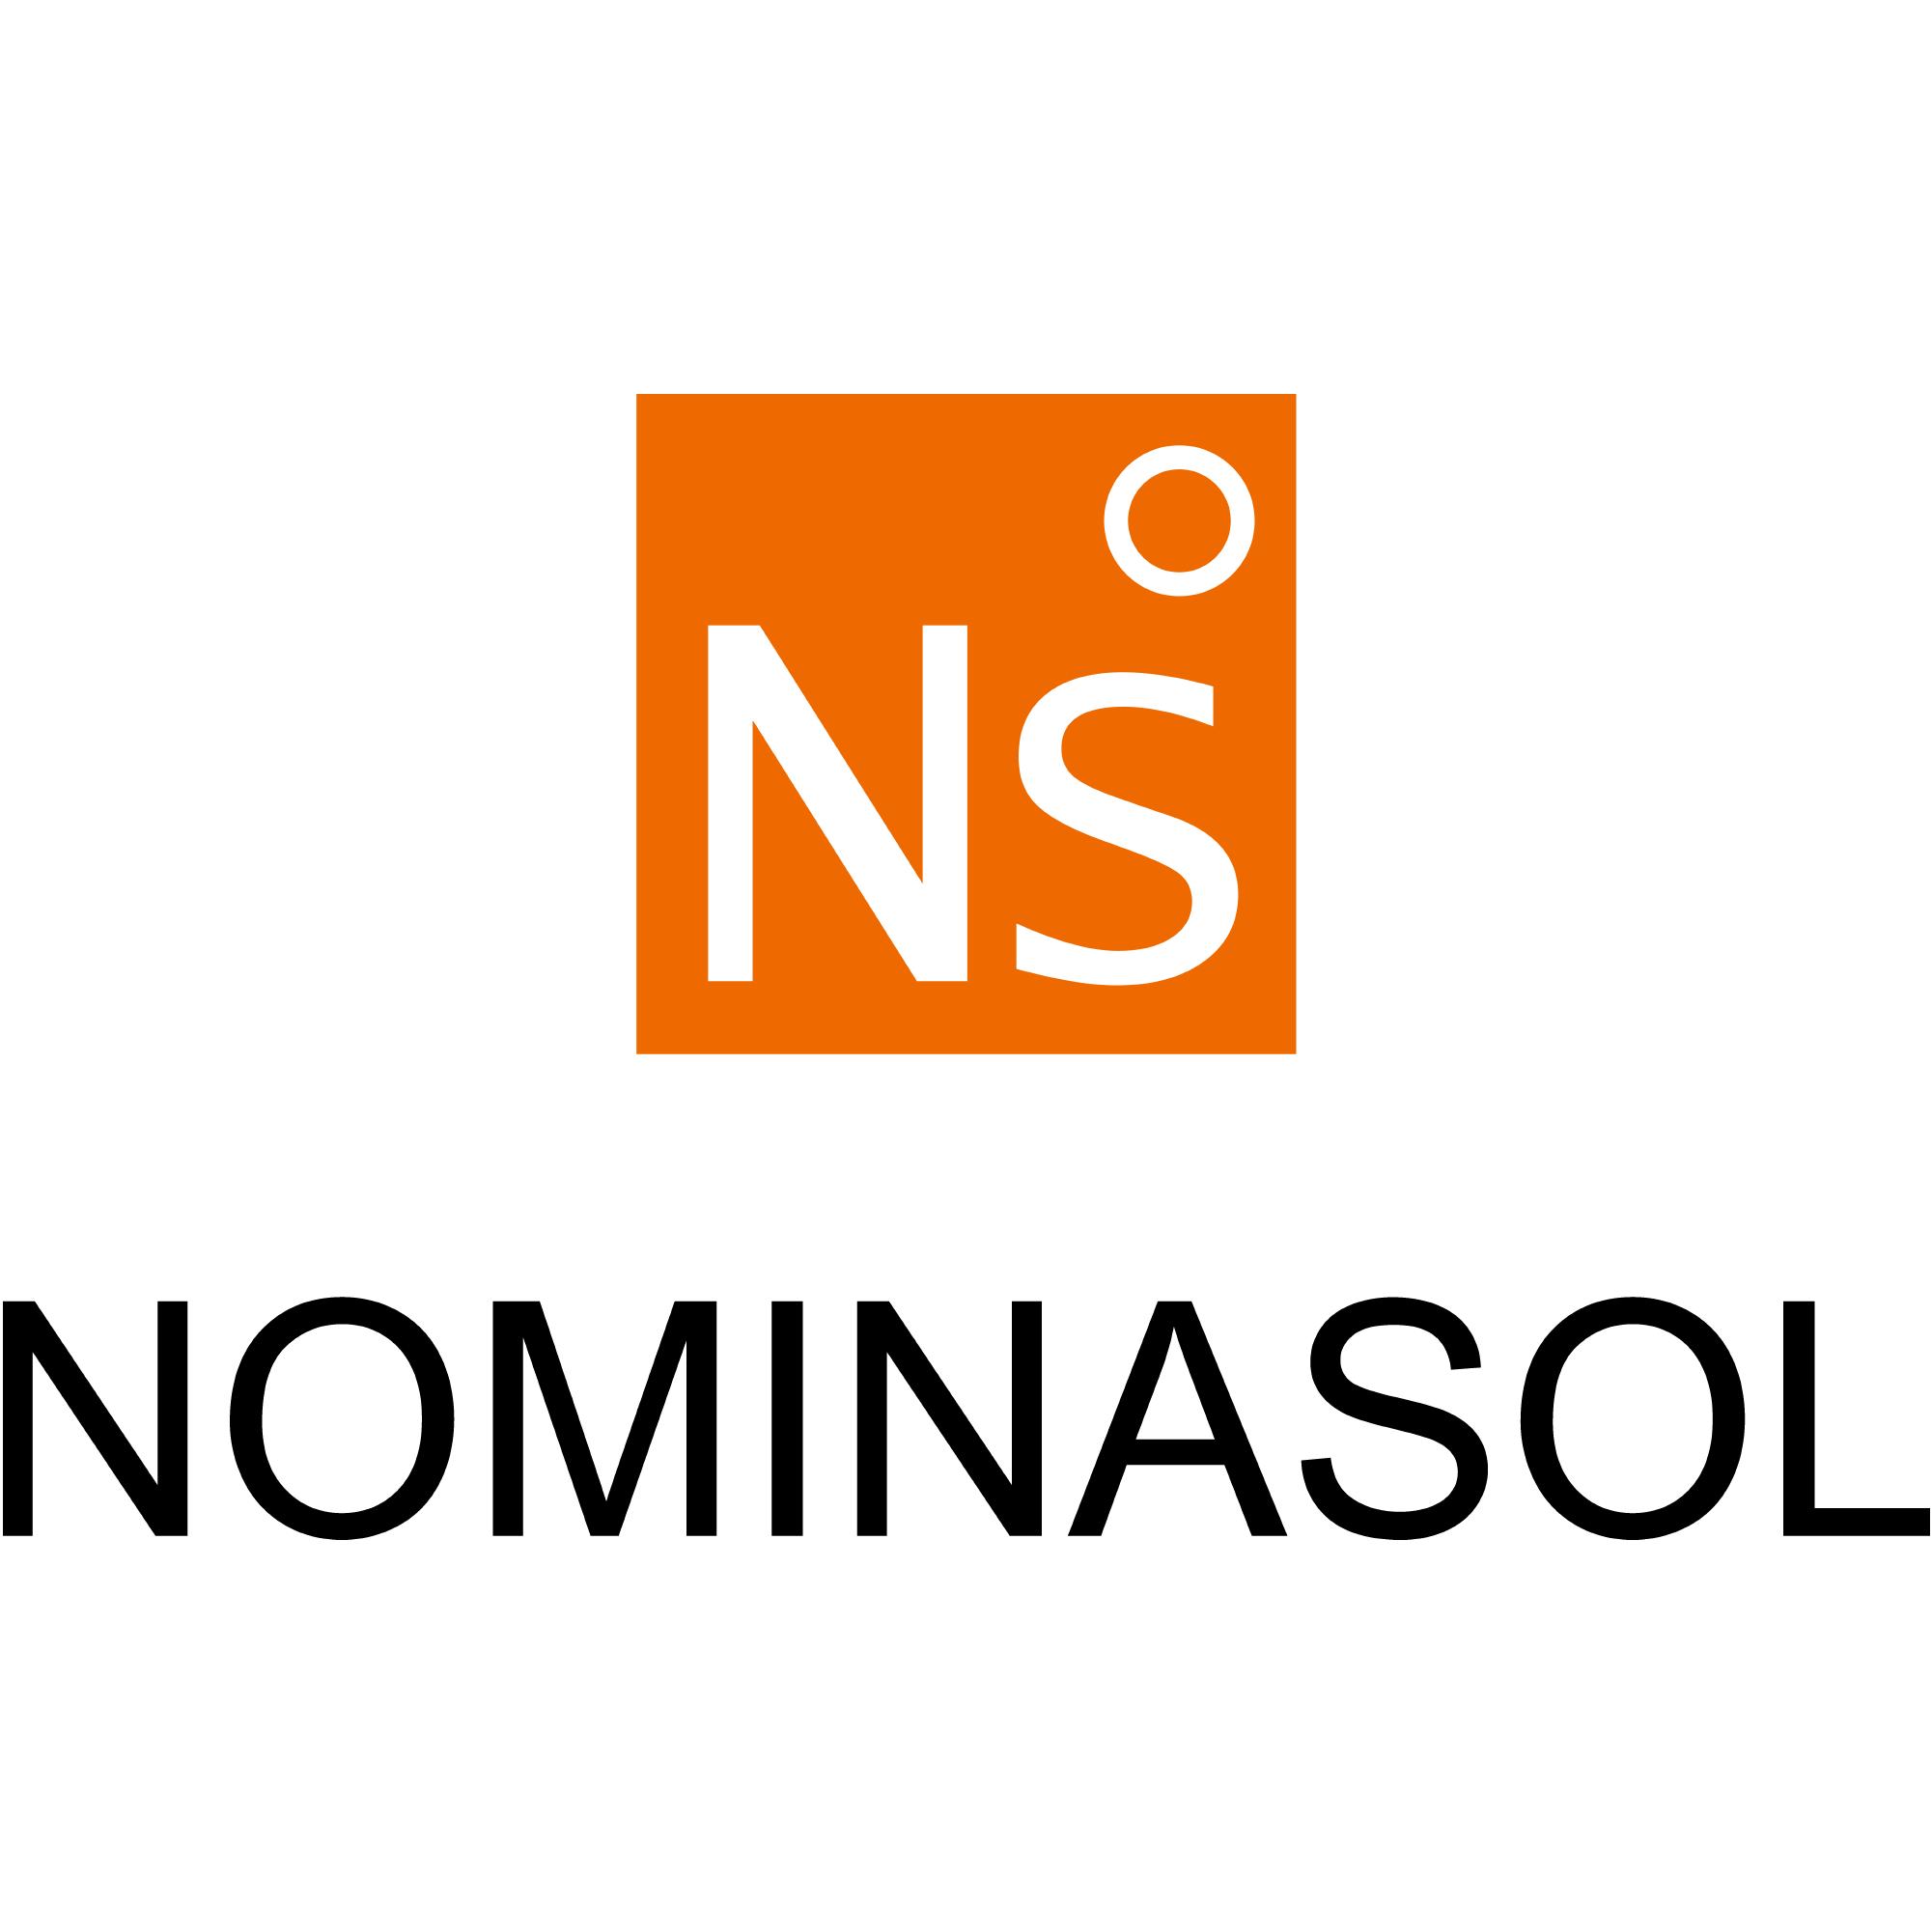 NOMINASOL, un producto de Software del Sol